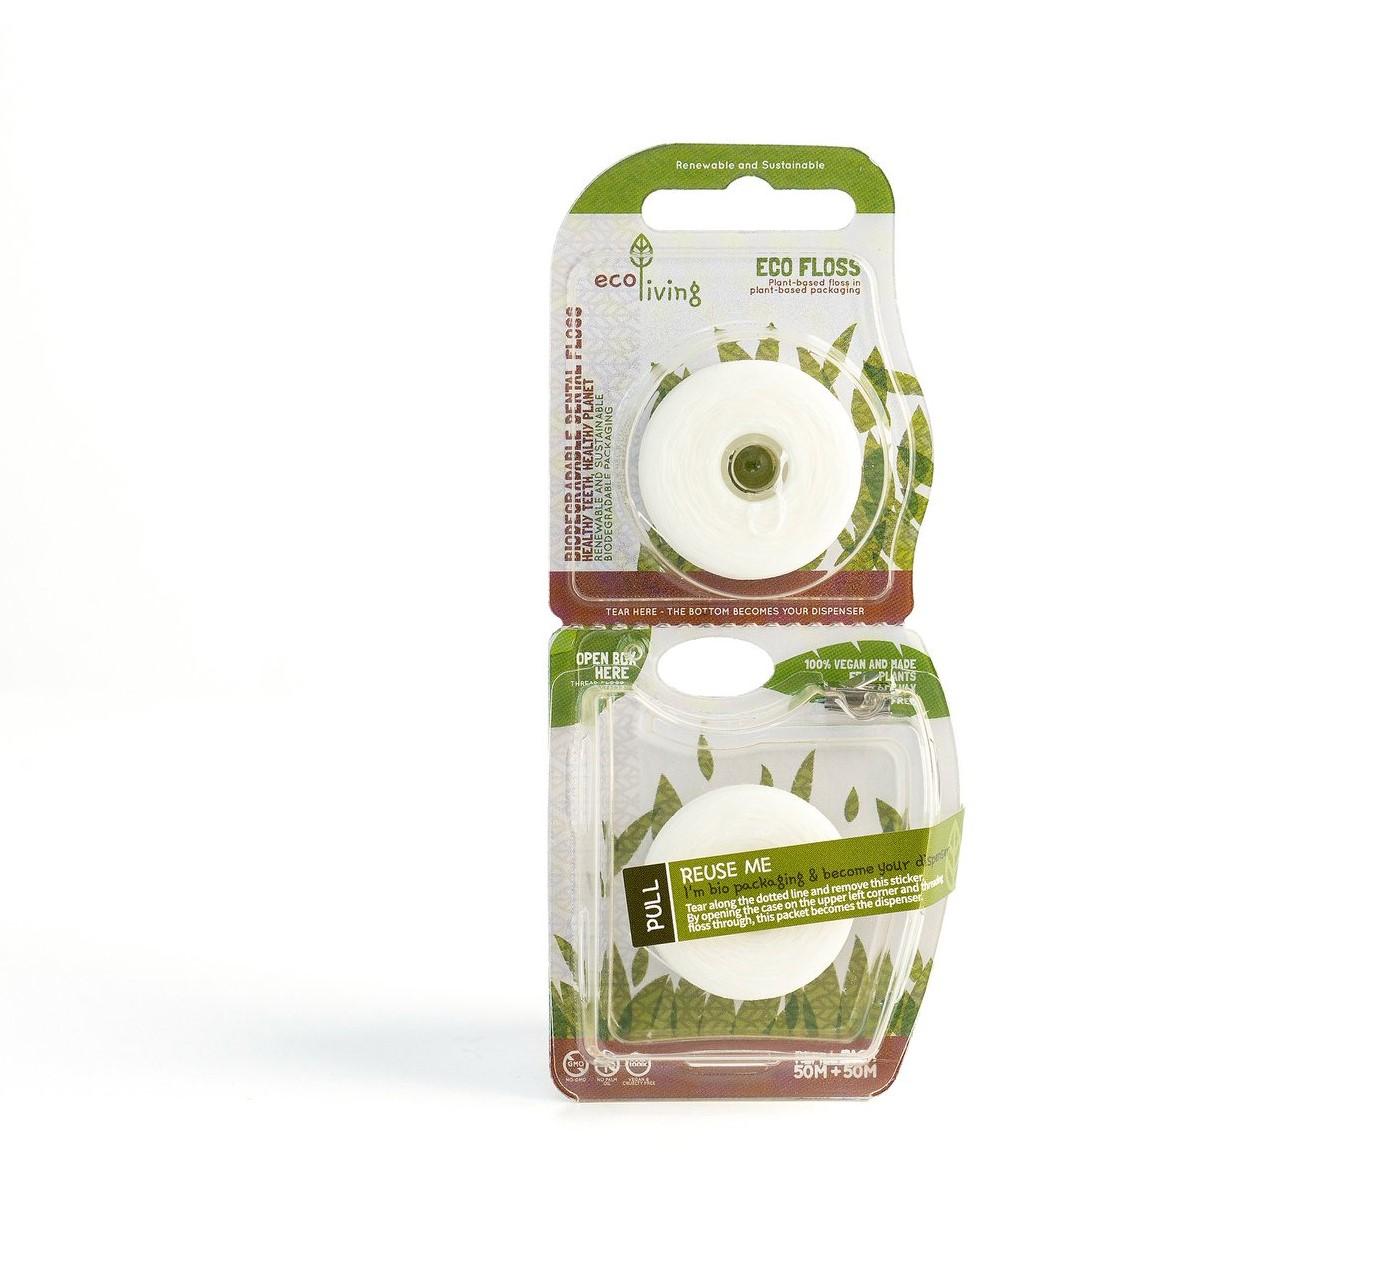 Biodegradable Dental Floss (2 Pack)